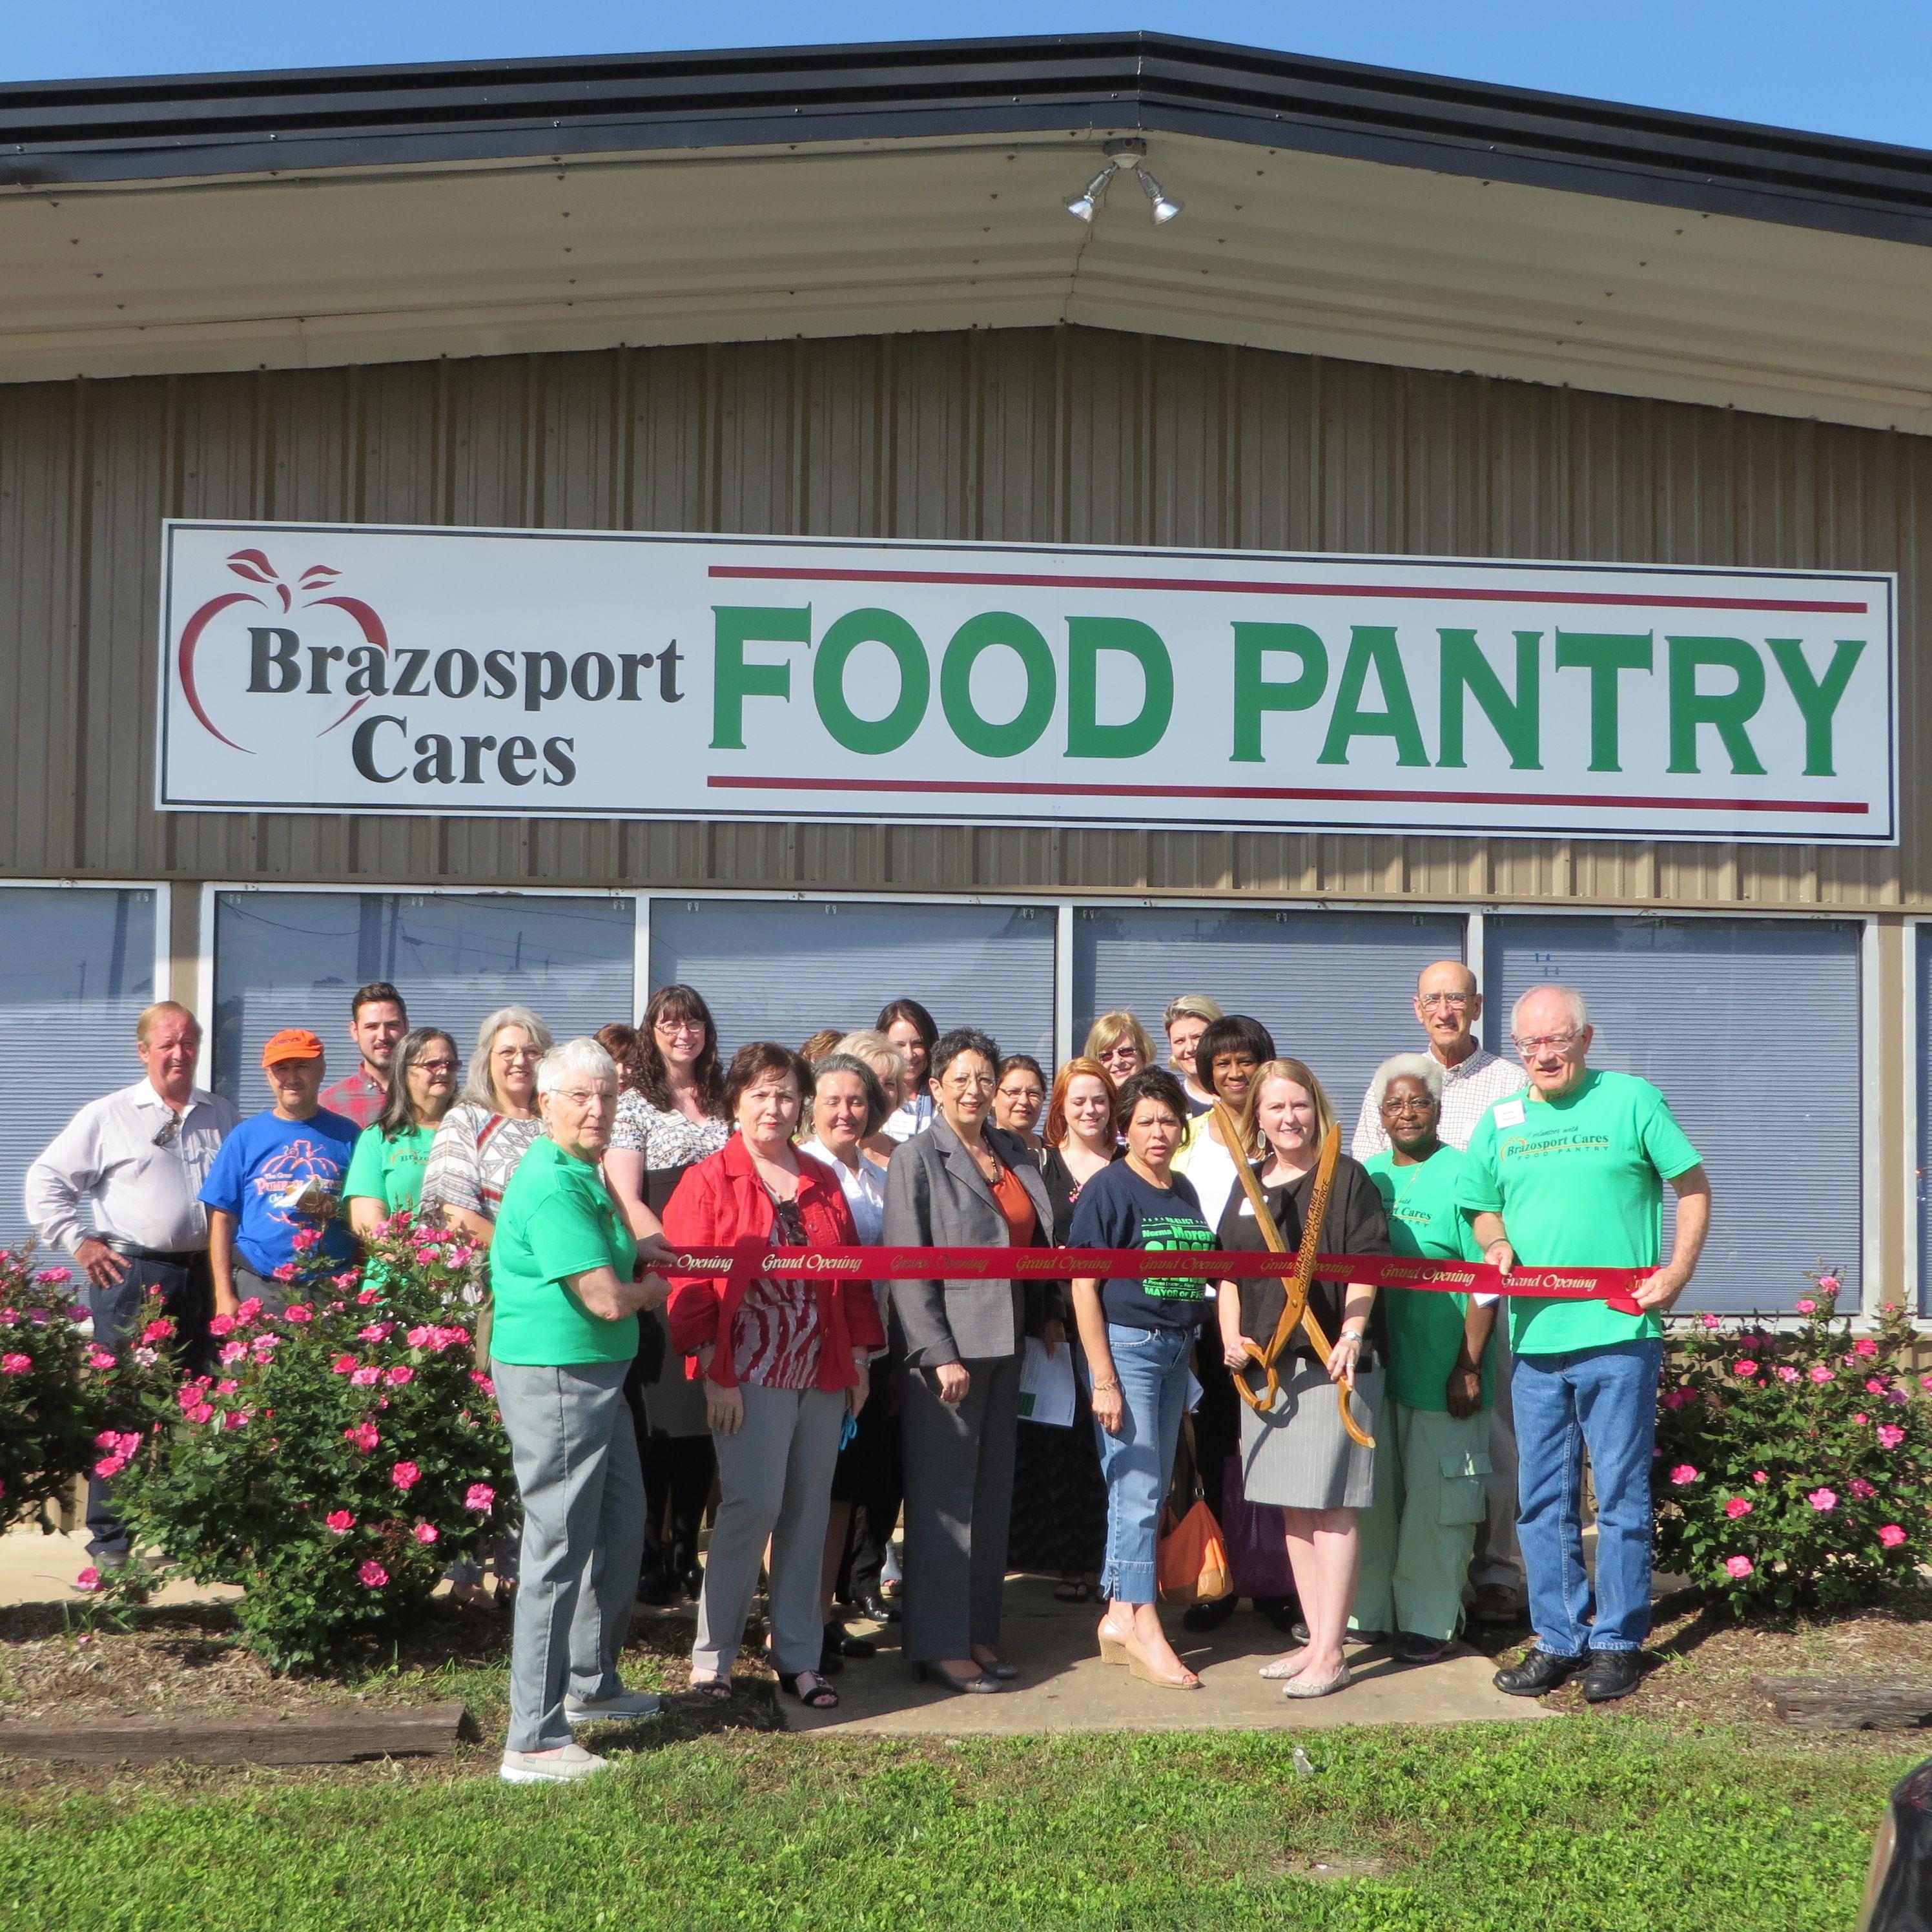 Brazosport cares food pantry 916 n gulf blvd freeport